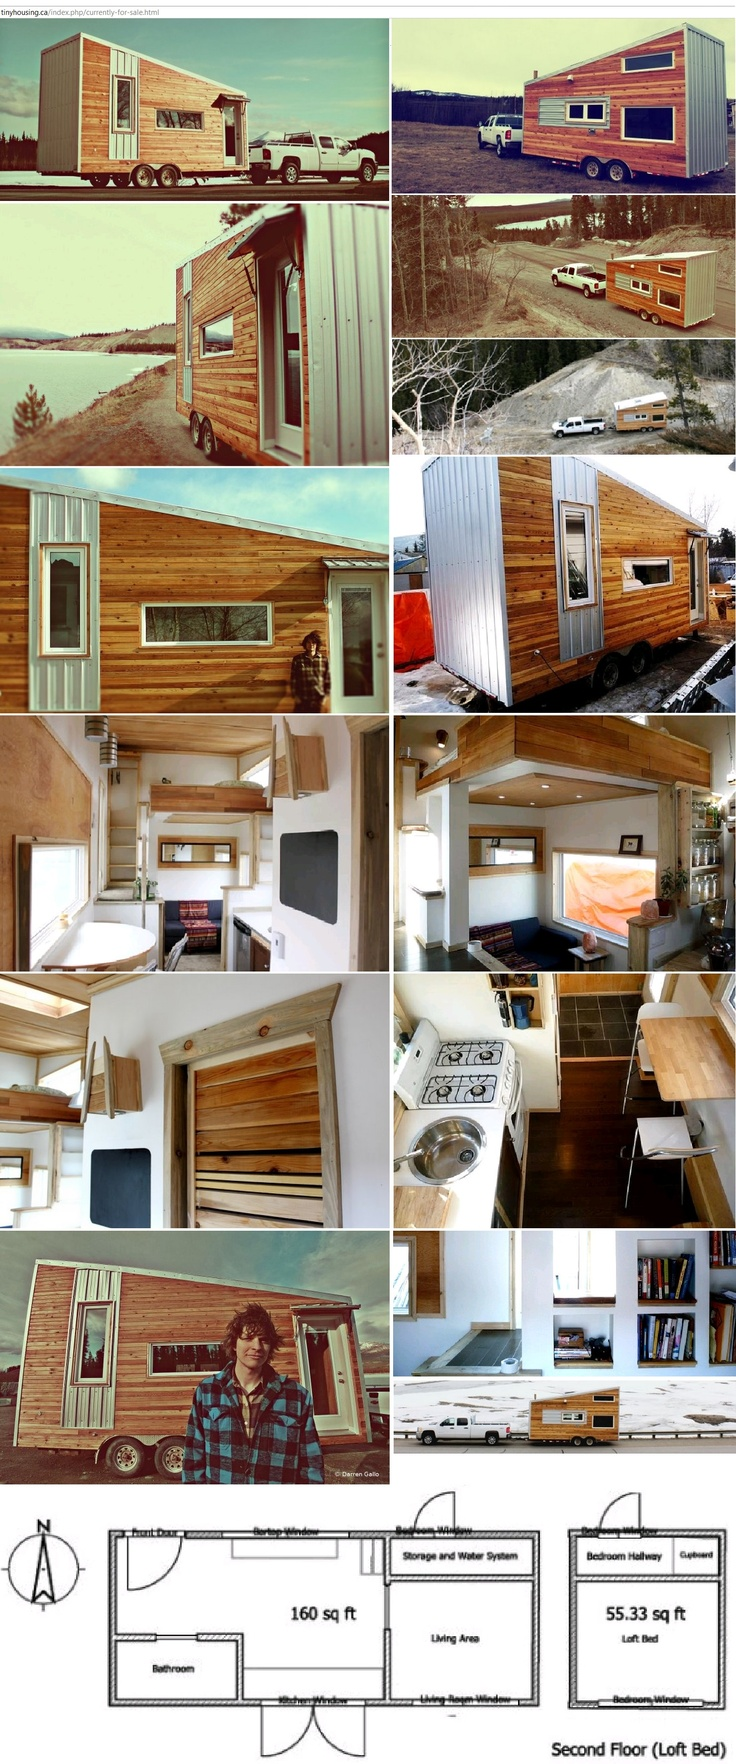 170 best caravanas images on pinterest vintage campers vintage trailers and gypsy wagon